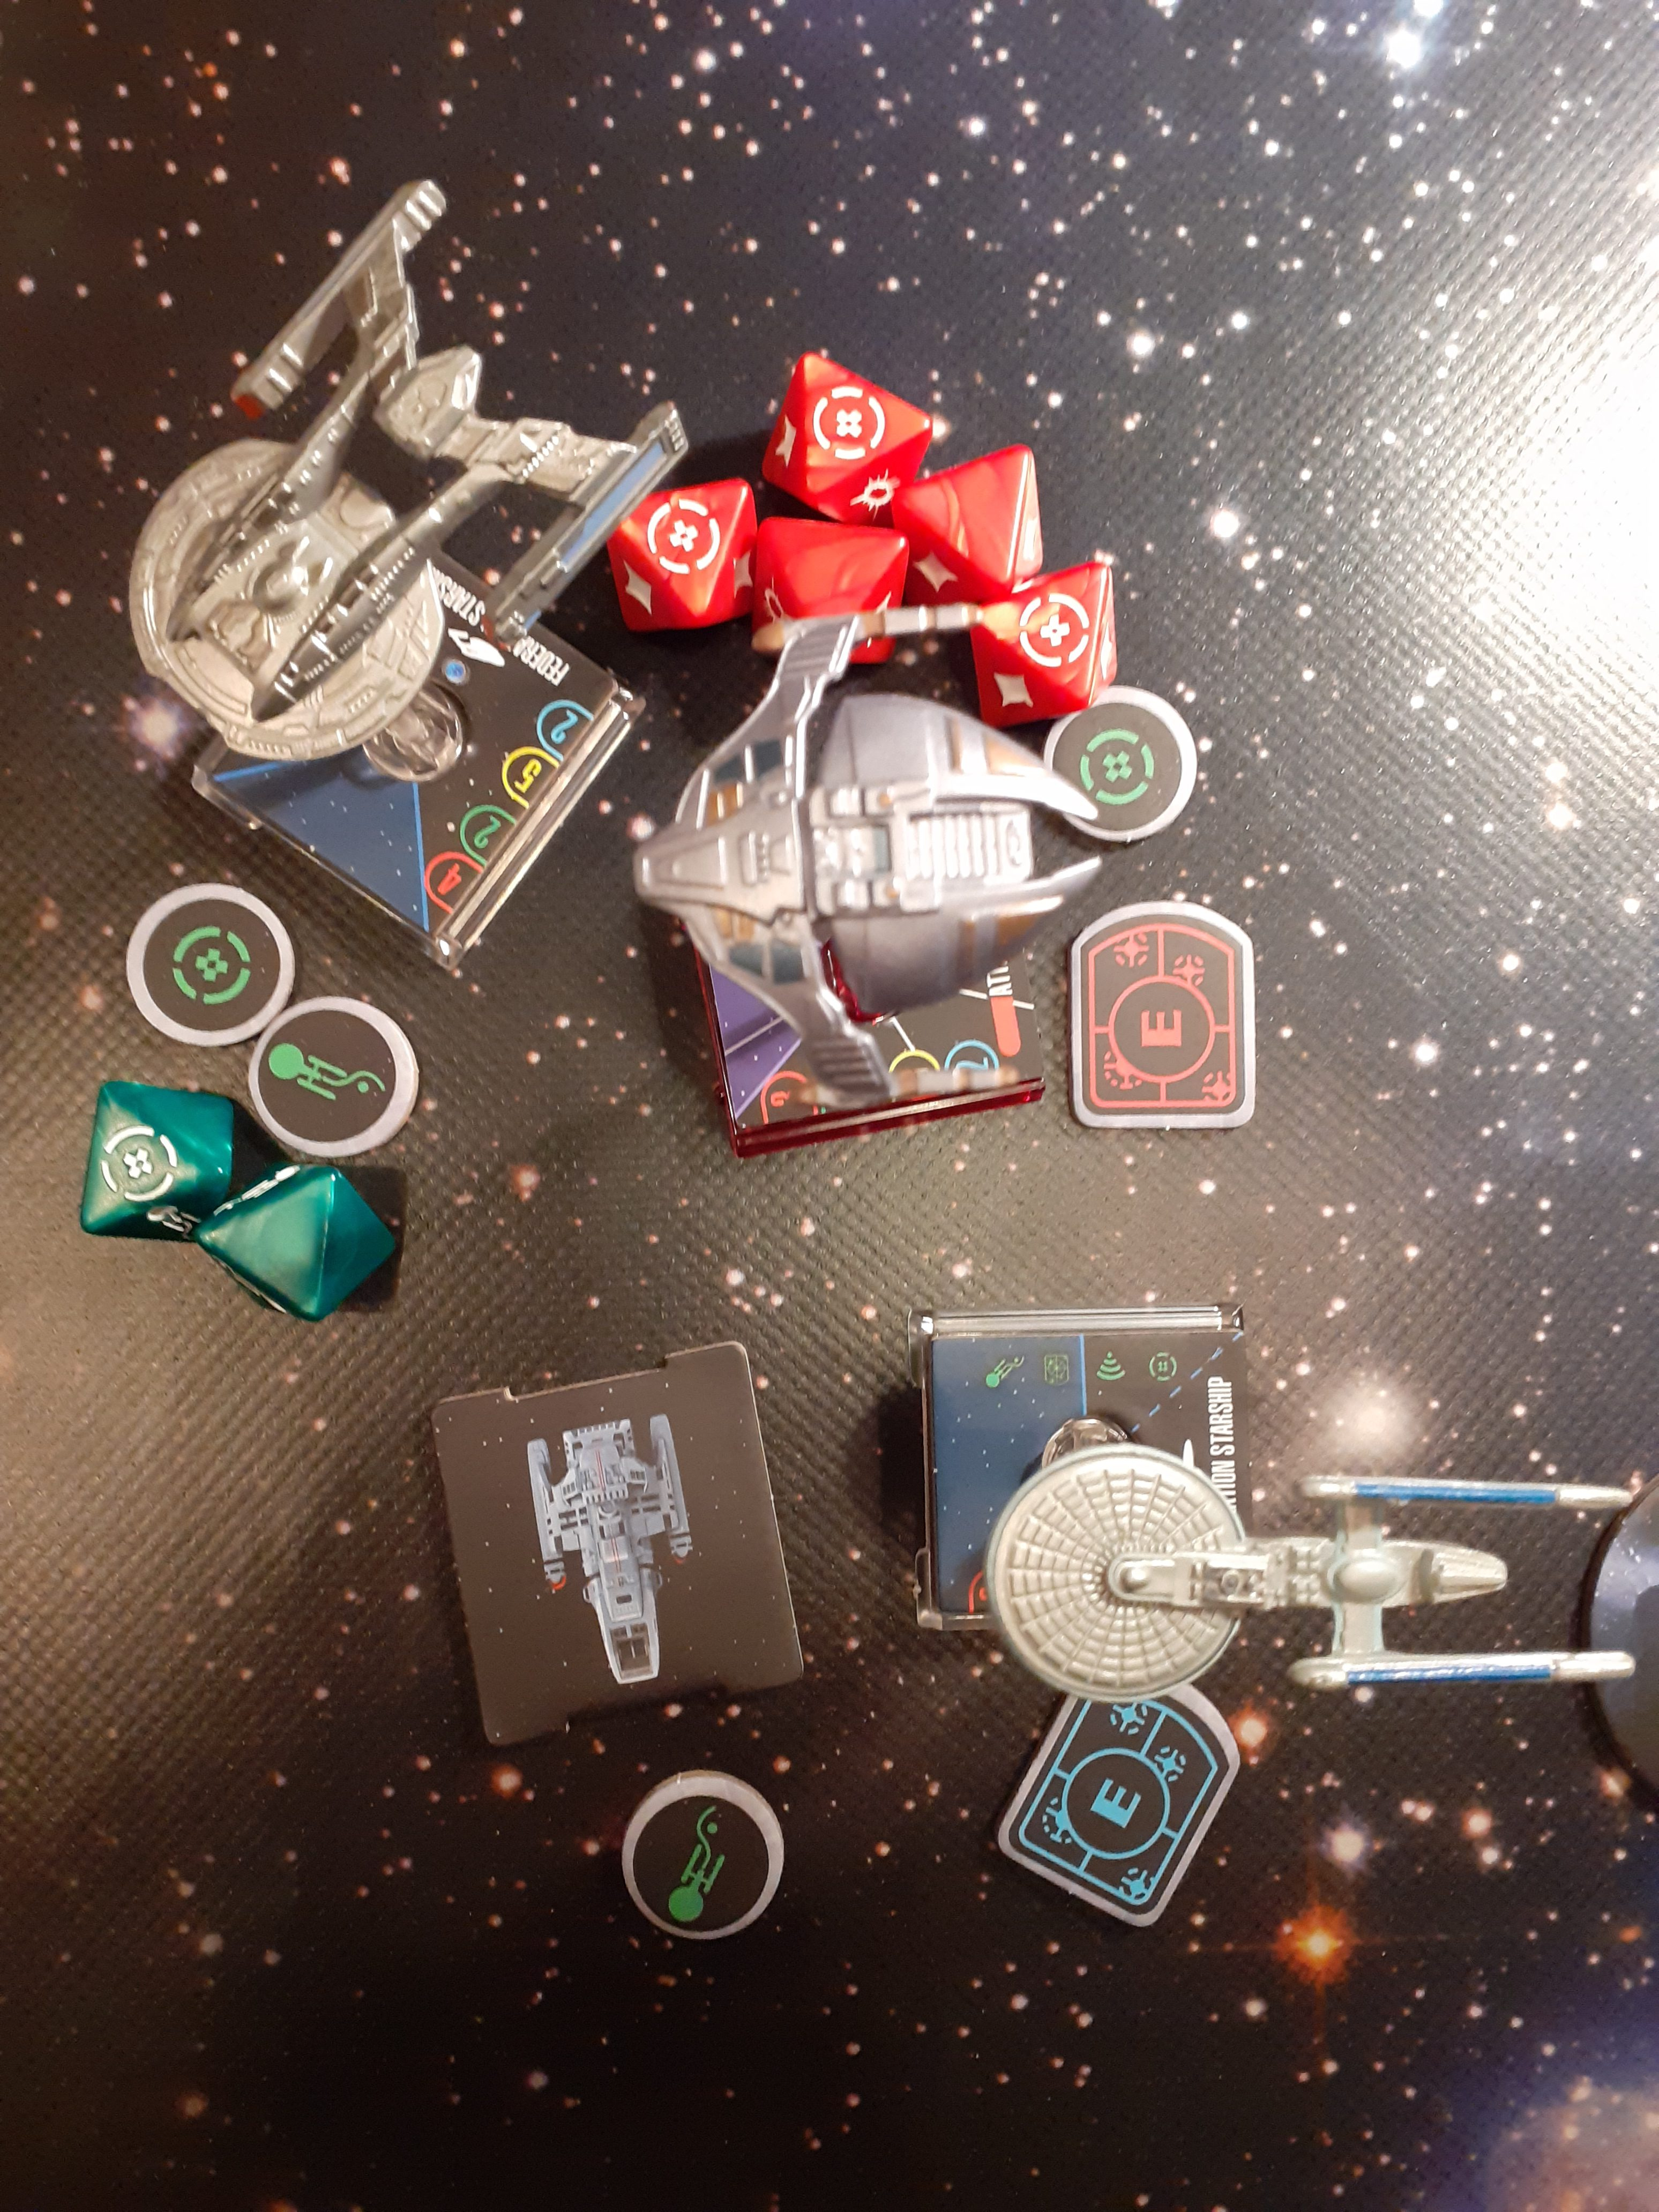 [Star Trek Alliance - Dominion War Campaign I] Computerlogbuch der Solo-Kampagne von Commander Cut  20210403_020900-e1617448860490